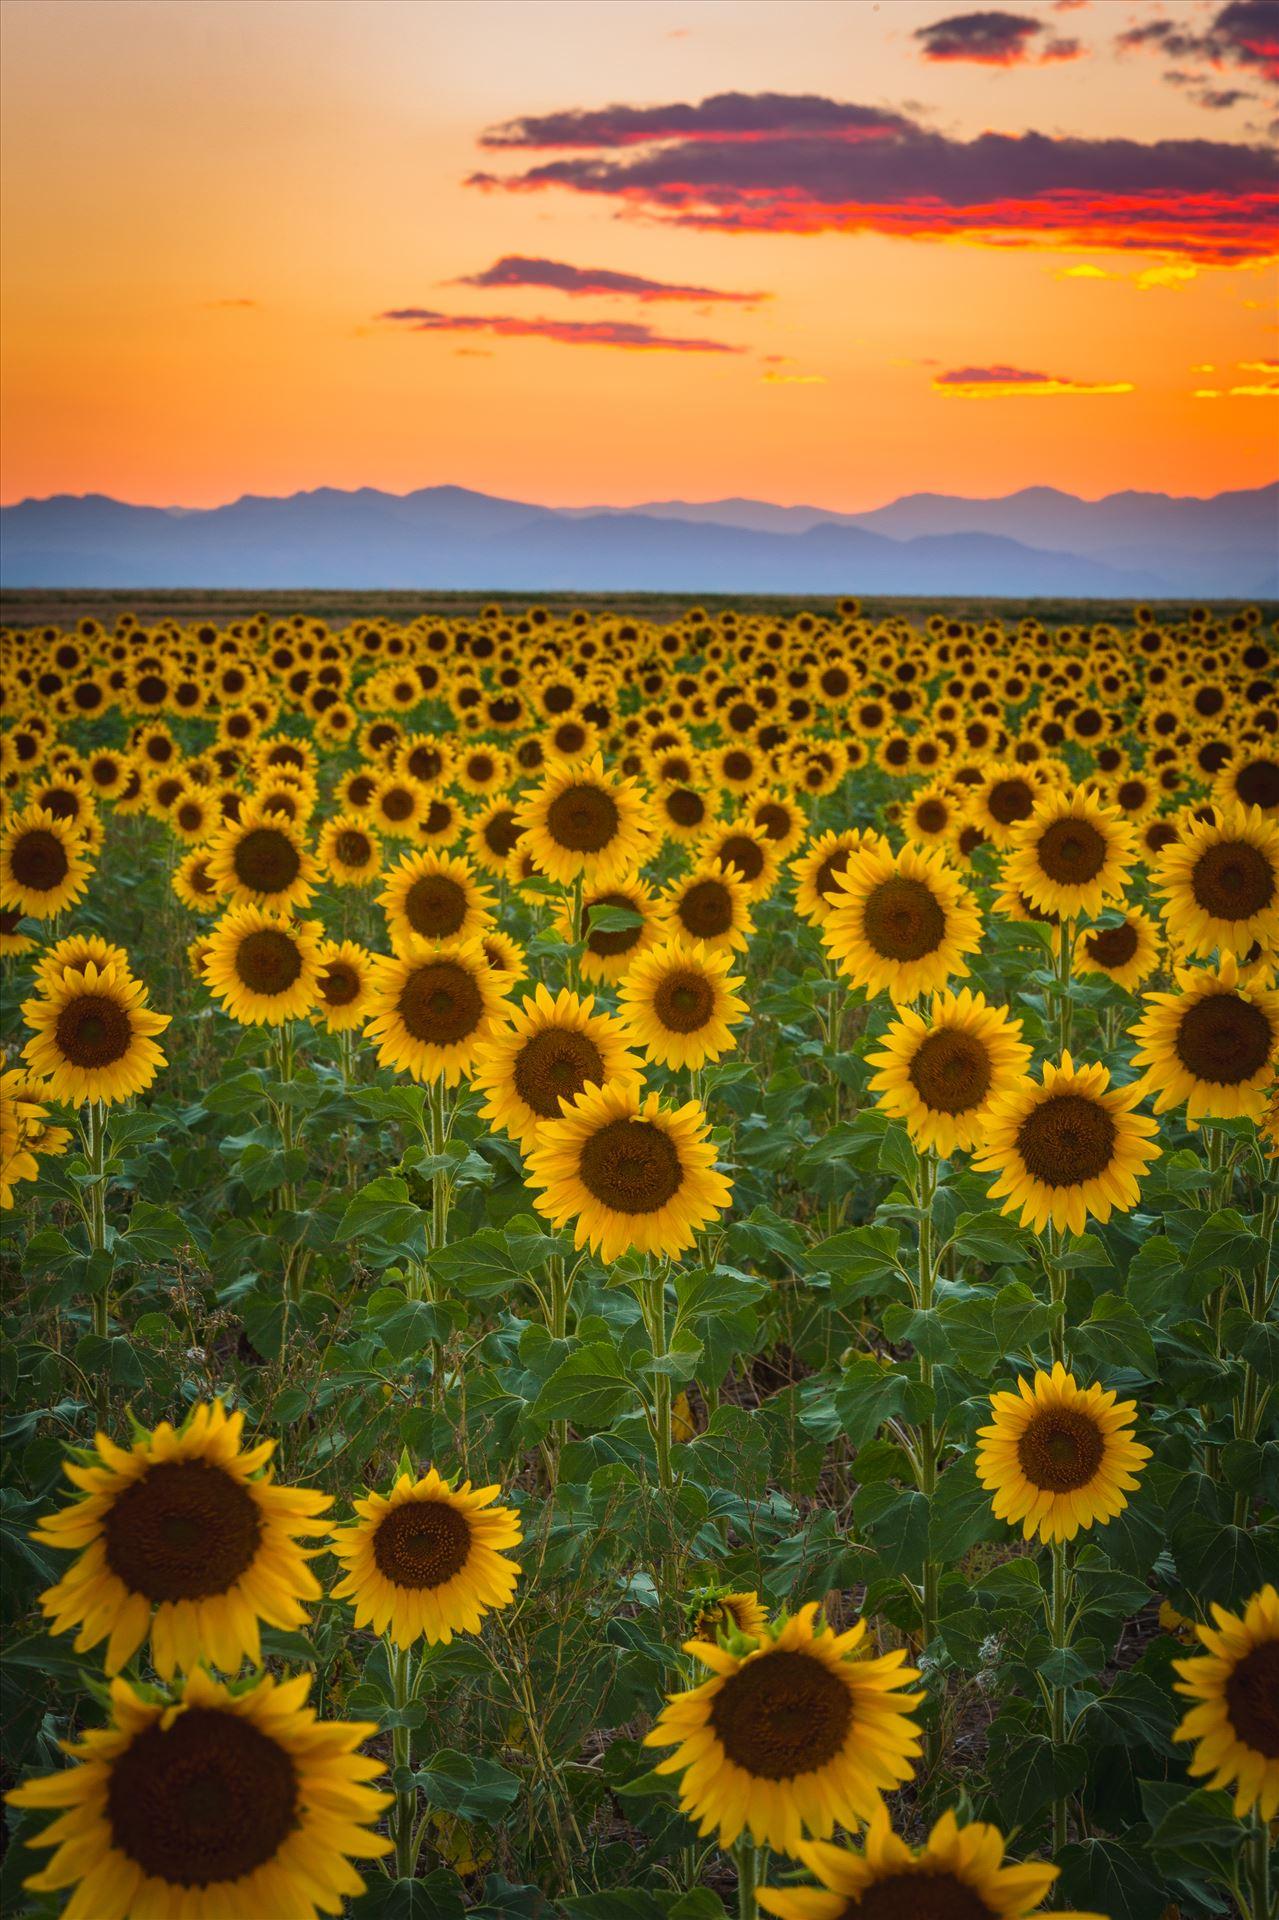 Denver Sunflowers at Sunset No 2 - Sunflower fields near Denver International Airport, on August 20th, 2016. Near 56th and E470. by D Scott Smith